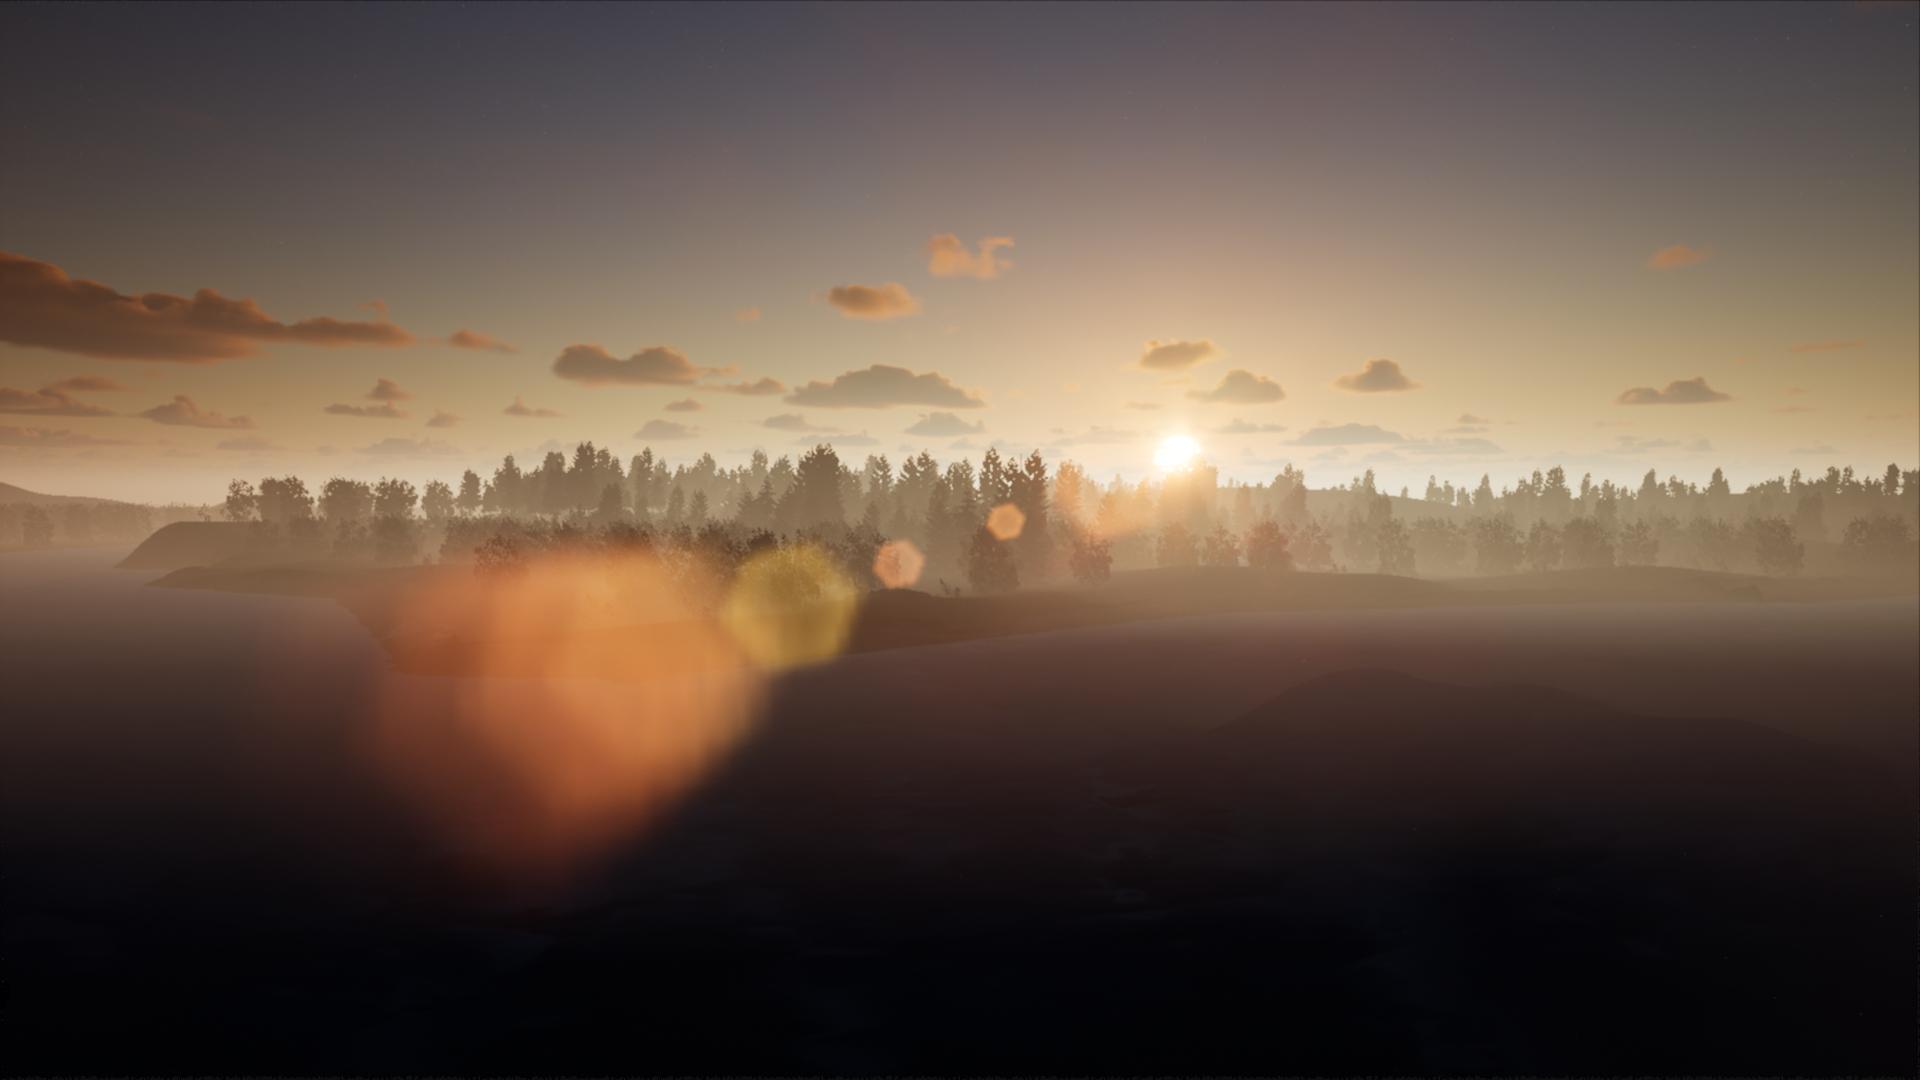 The Midnight Sun over Virtual Lapland